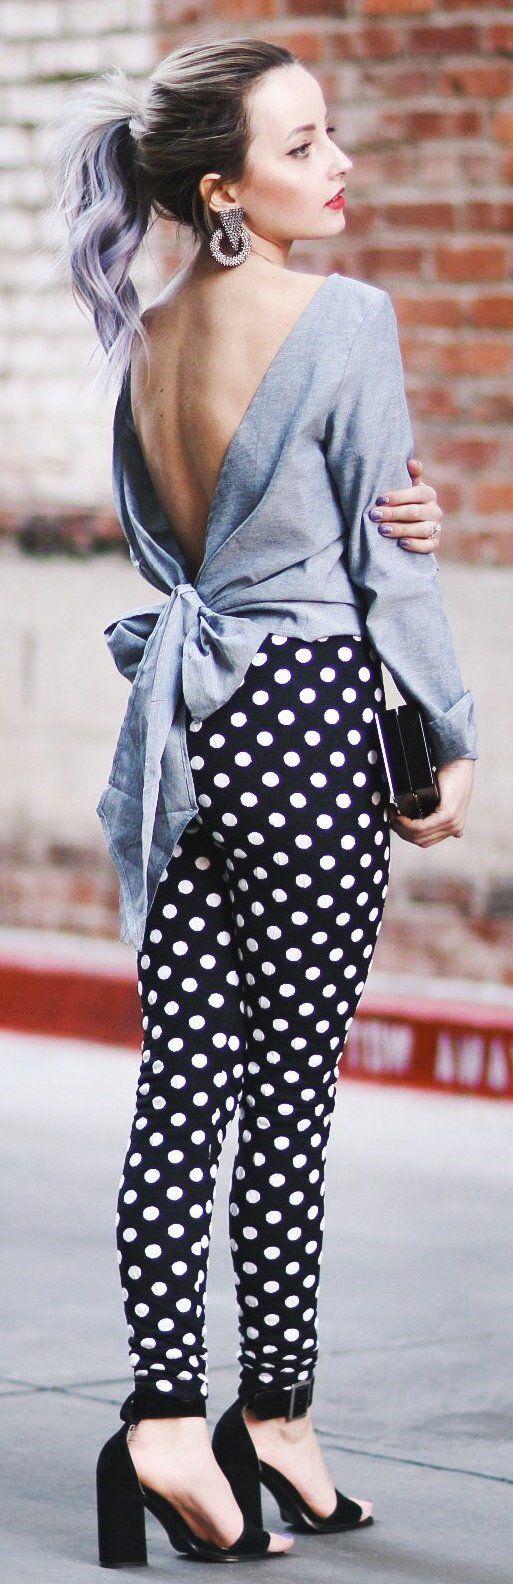 Grey Open Back Top / Black Dotted Pants / Black Sandals